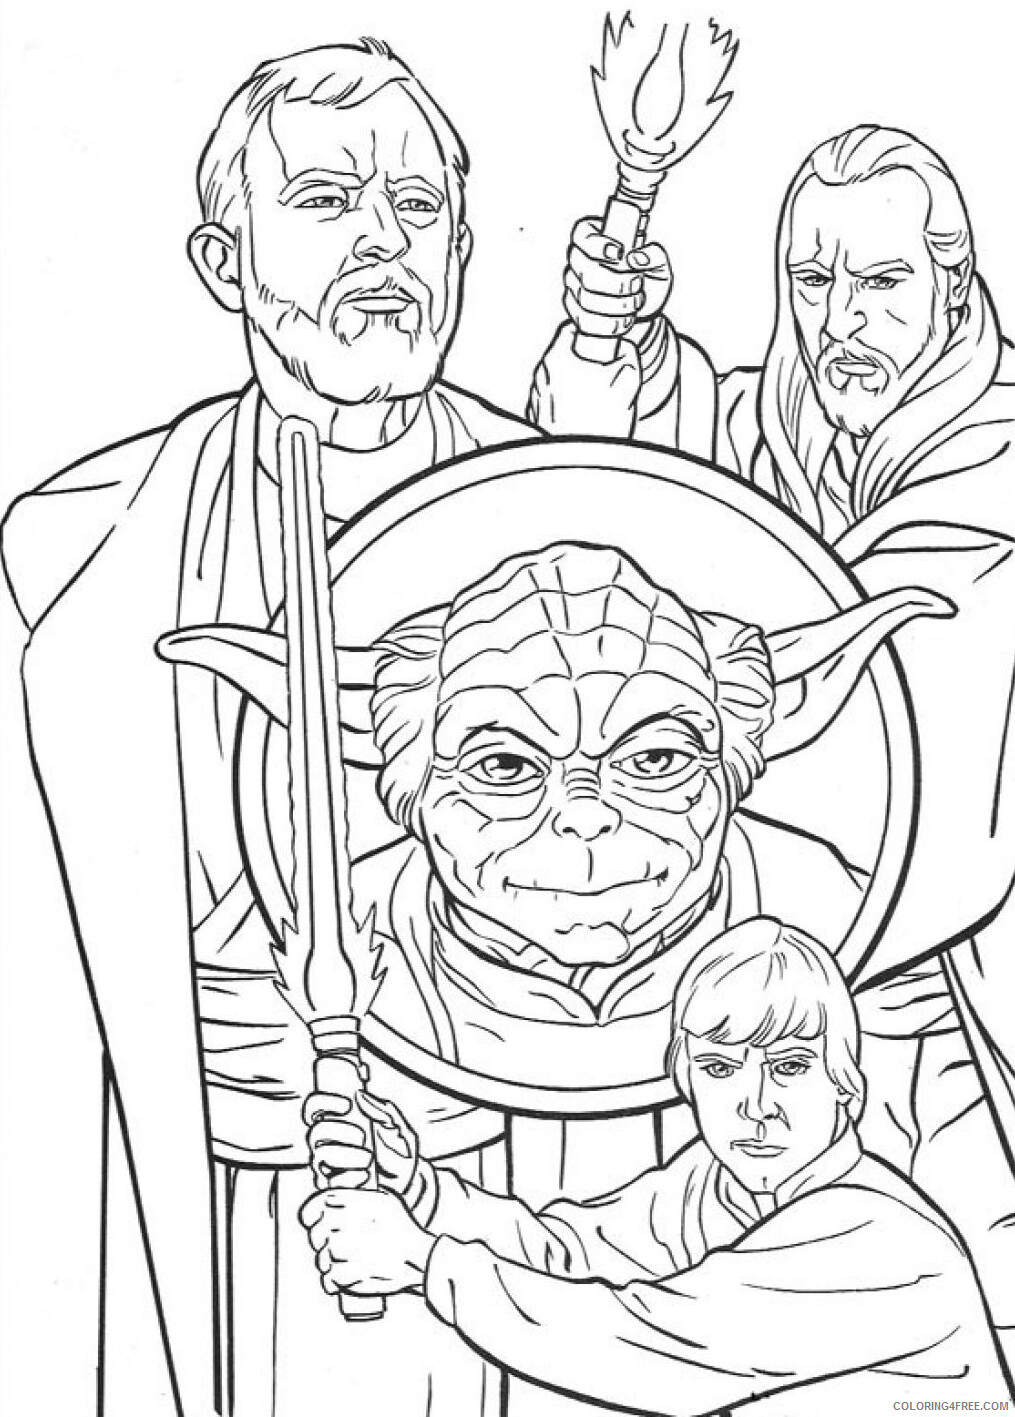 Star Wars Coloring Pages TV Film Characters Luke Skywalker Printable 2020 07954 Coloring4free